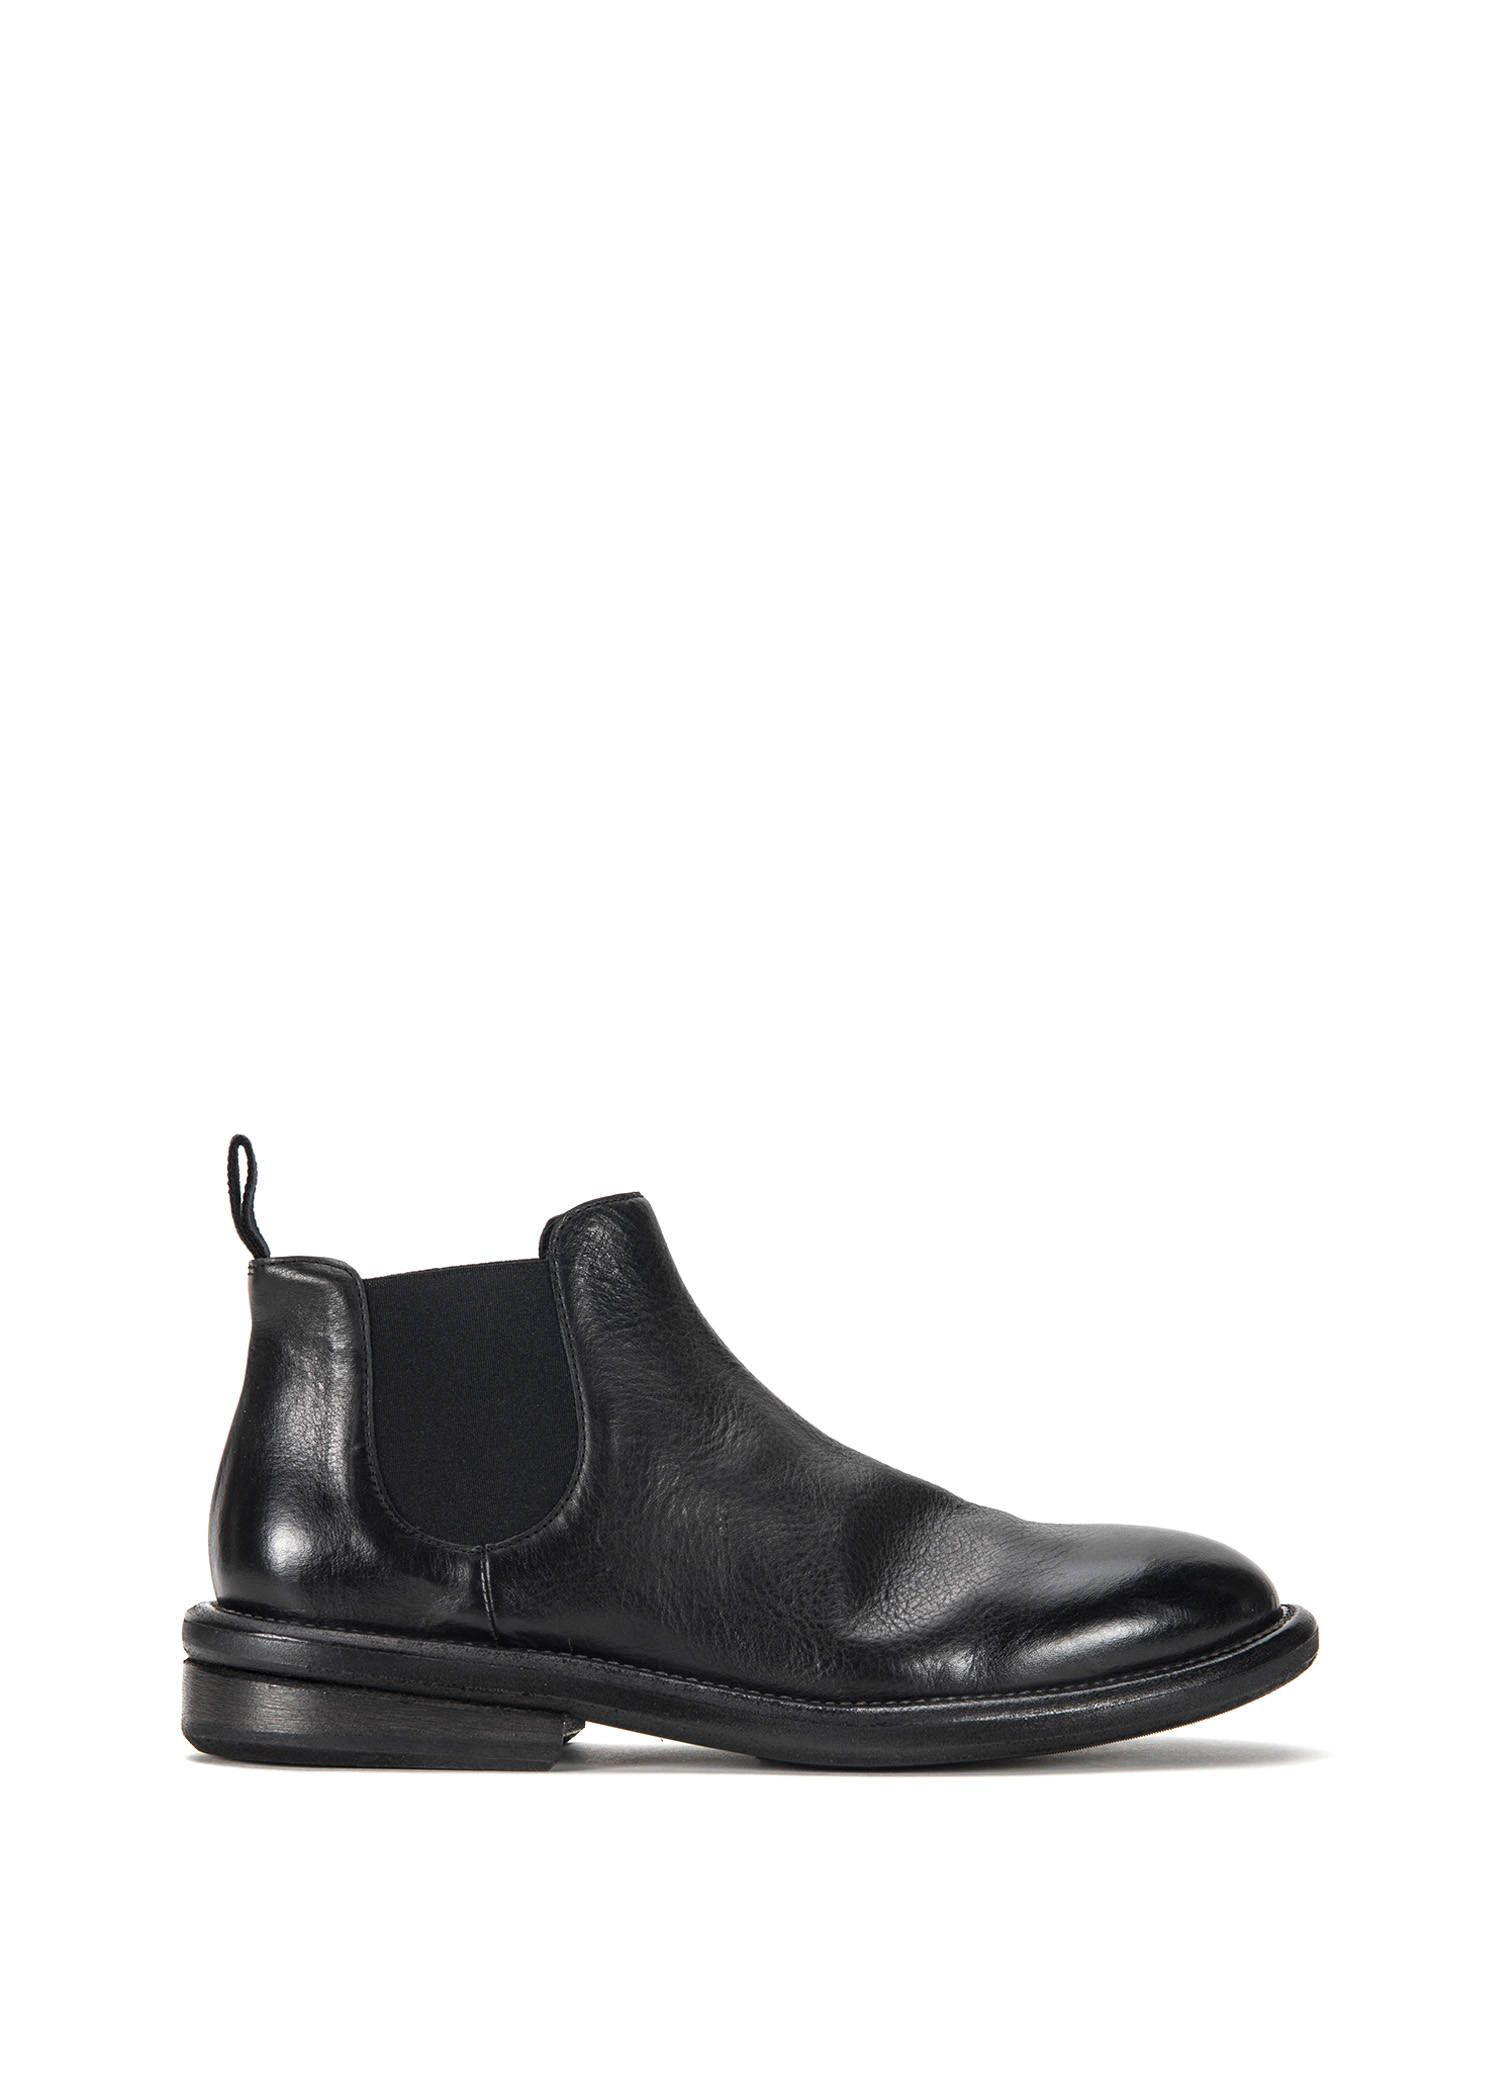 MarsÈll bombolone leather low chelsea boots marsèll shoes